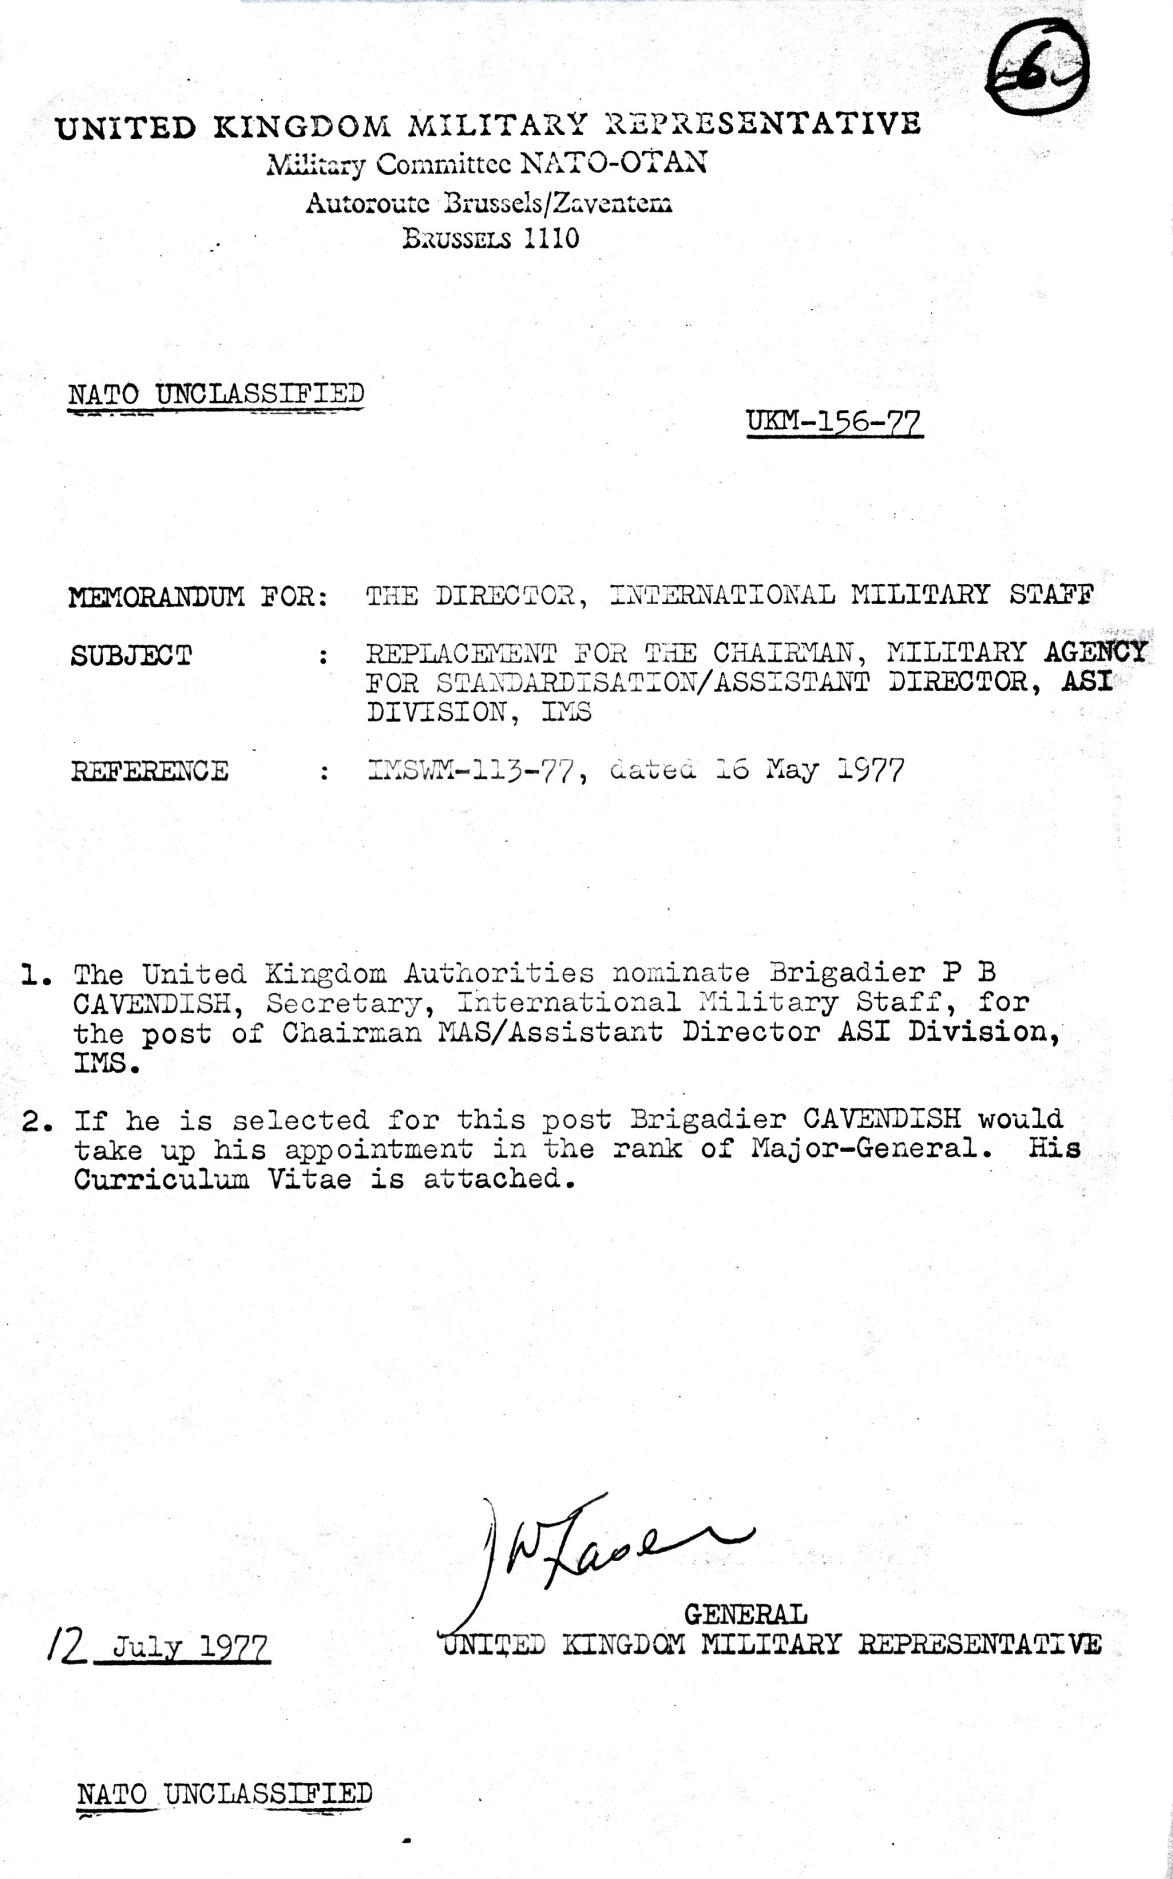 00828 977-07-12 Cargo na NATO MOD UK comunica candidatura e currículo Brigadier P B Cavendish aos cargos NATO -pg 1